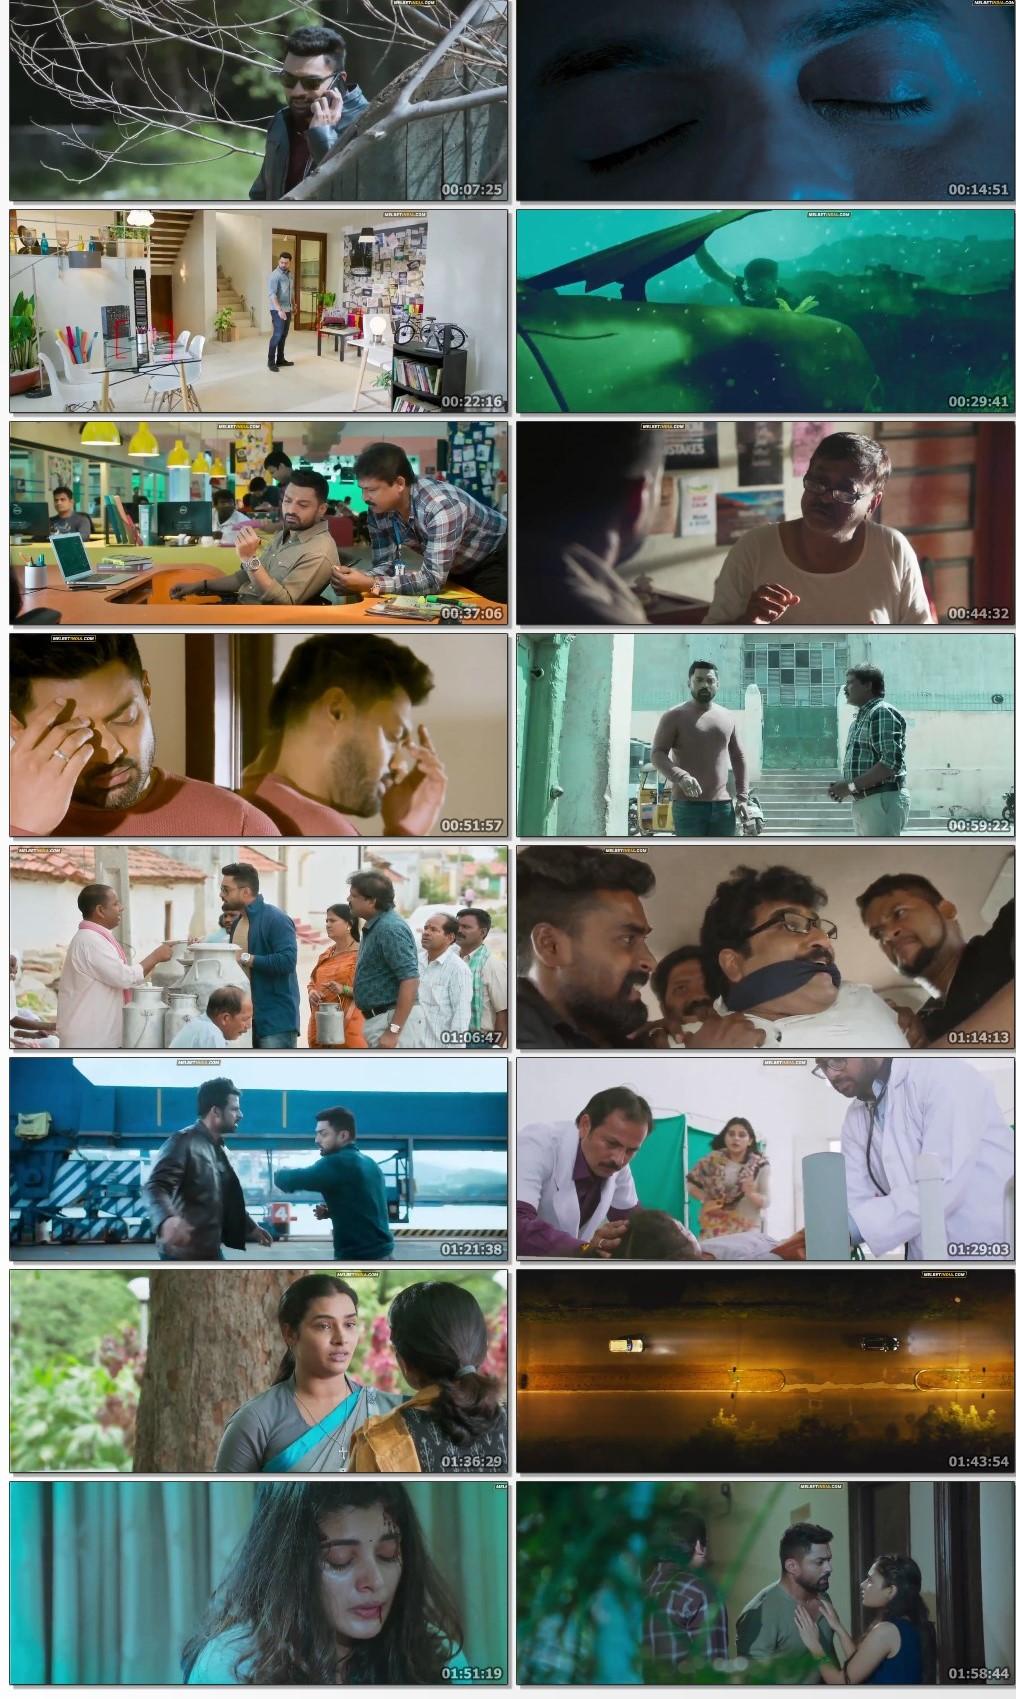 118-2019-www-9kmovies-work-HQ-Hindi-Dubbed-720p-HDRip-850-MB-mkv-thumbs1c0e0fbd6e4d0b42